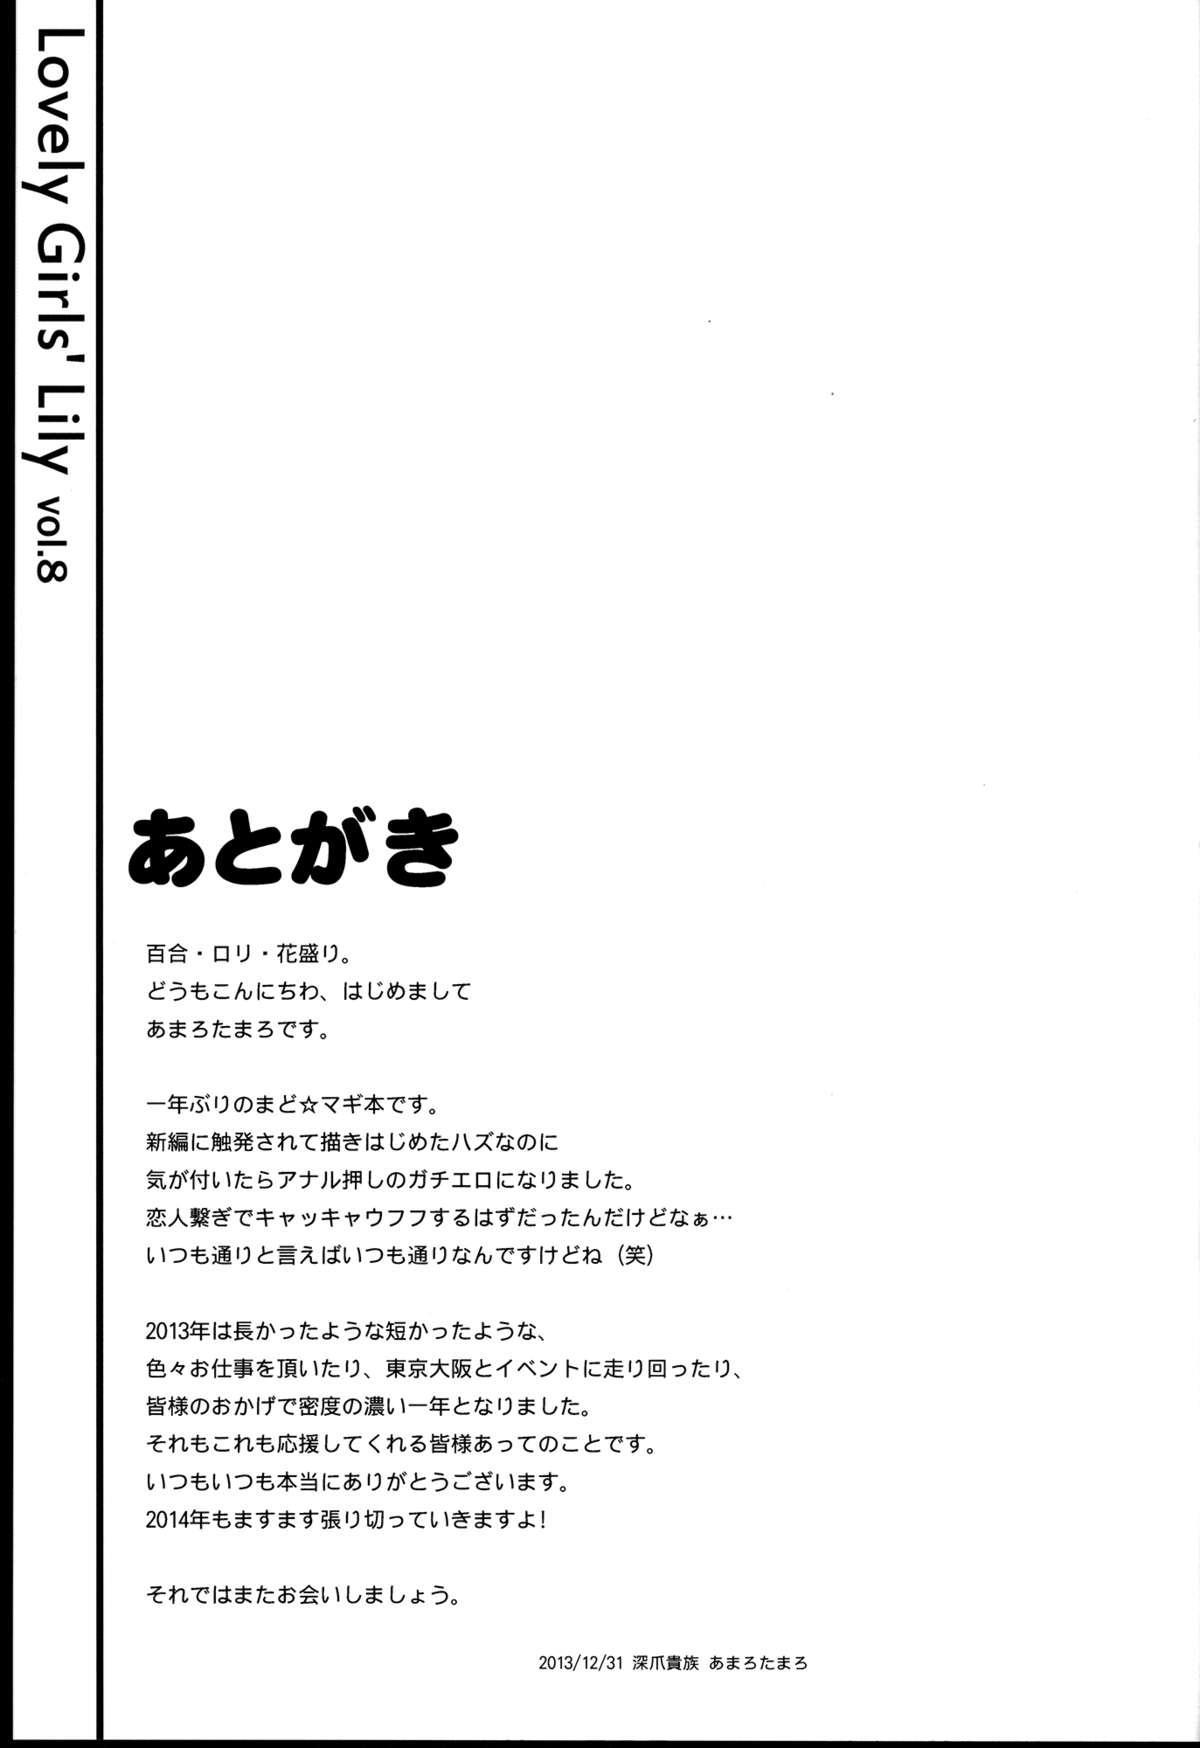 Lovely Girls' Lily vol.8 16